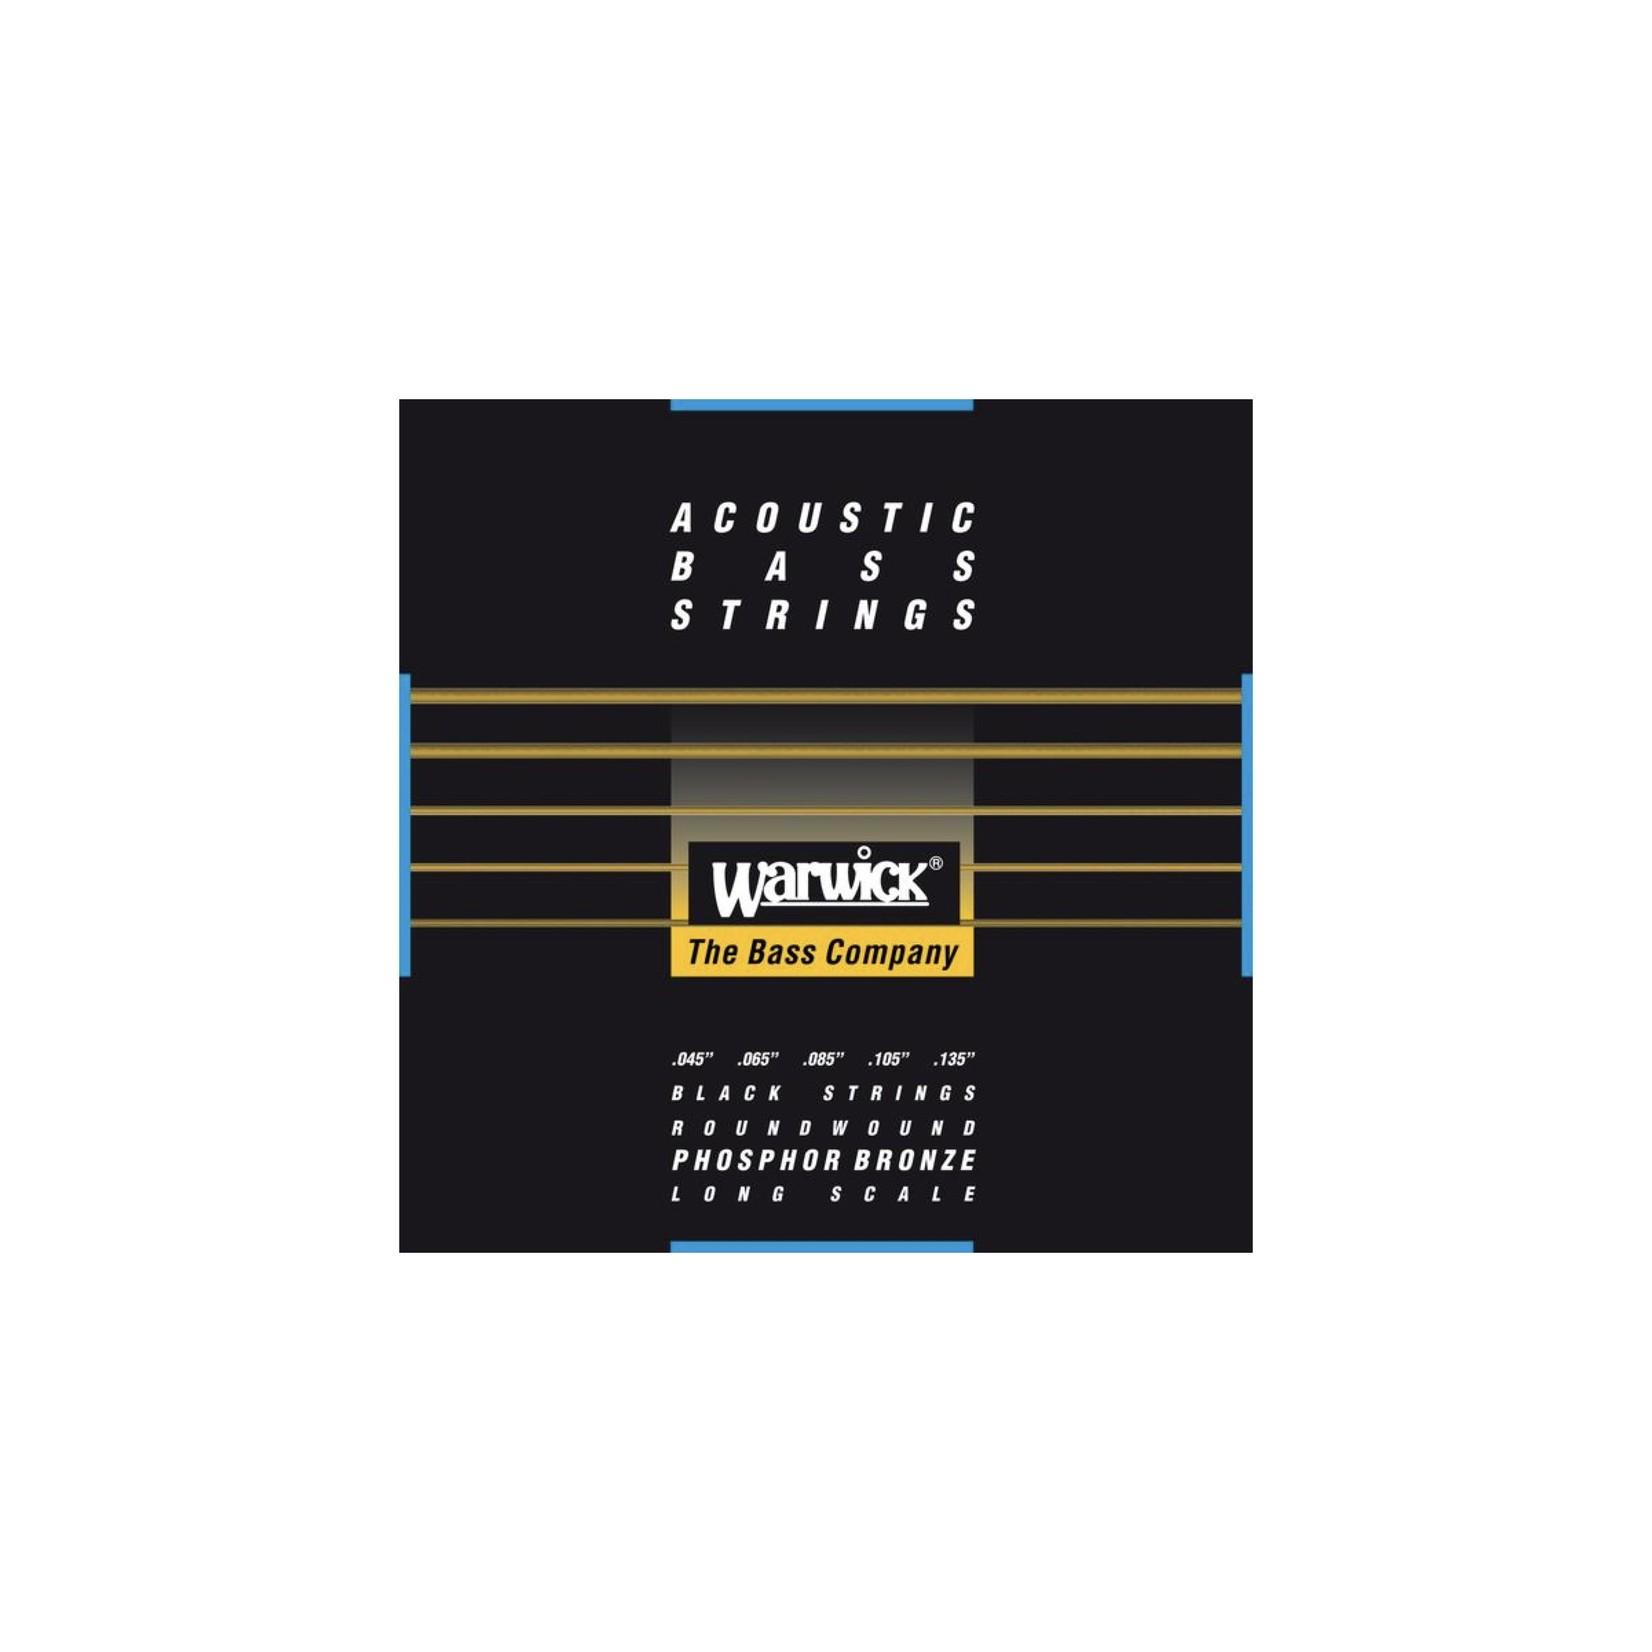 Warwick Warwick Black Label - Acoustic Bass Strings, 5-String Set (45-135), Phosphor Bronze, Long Scale